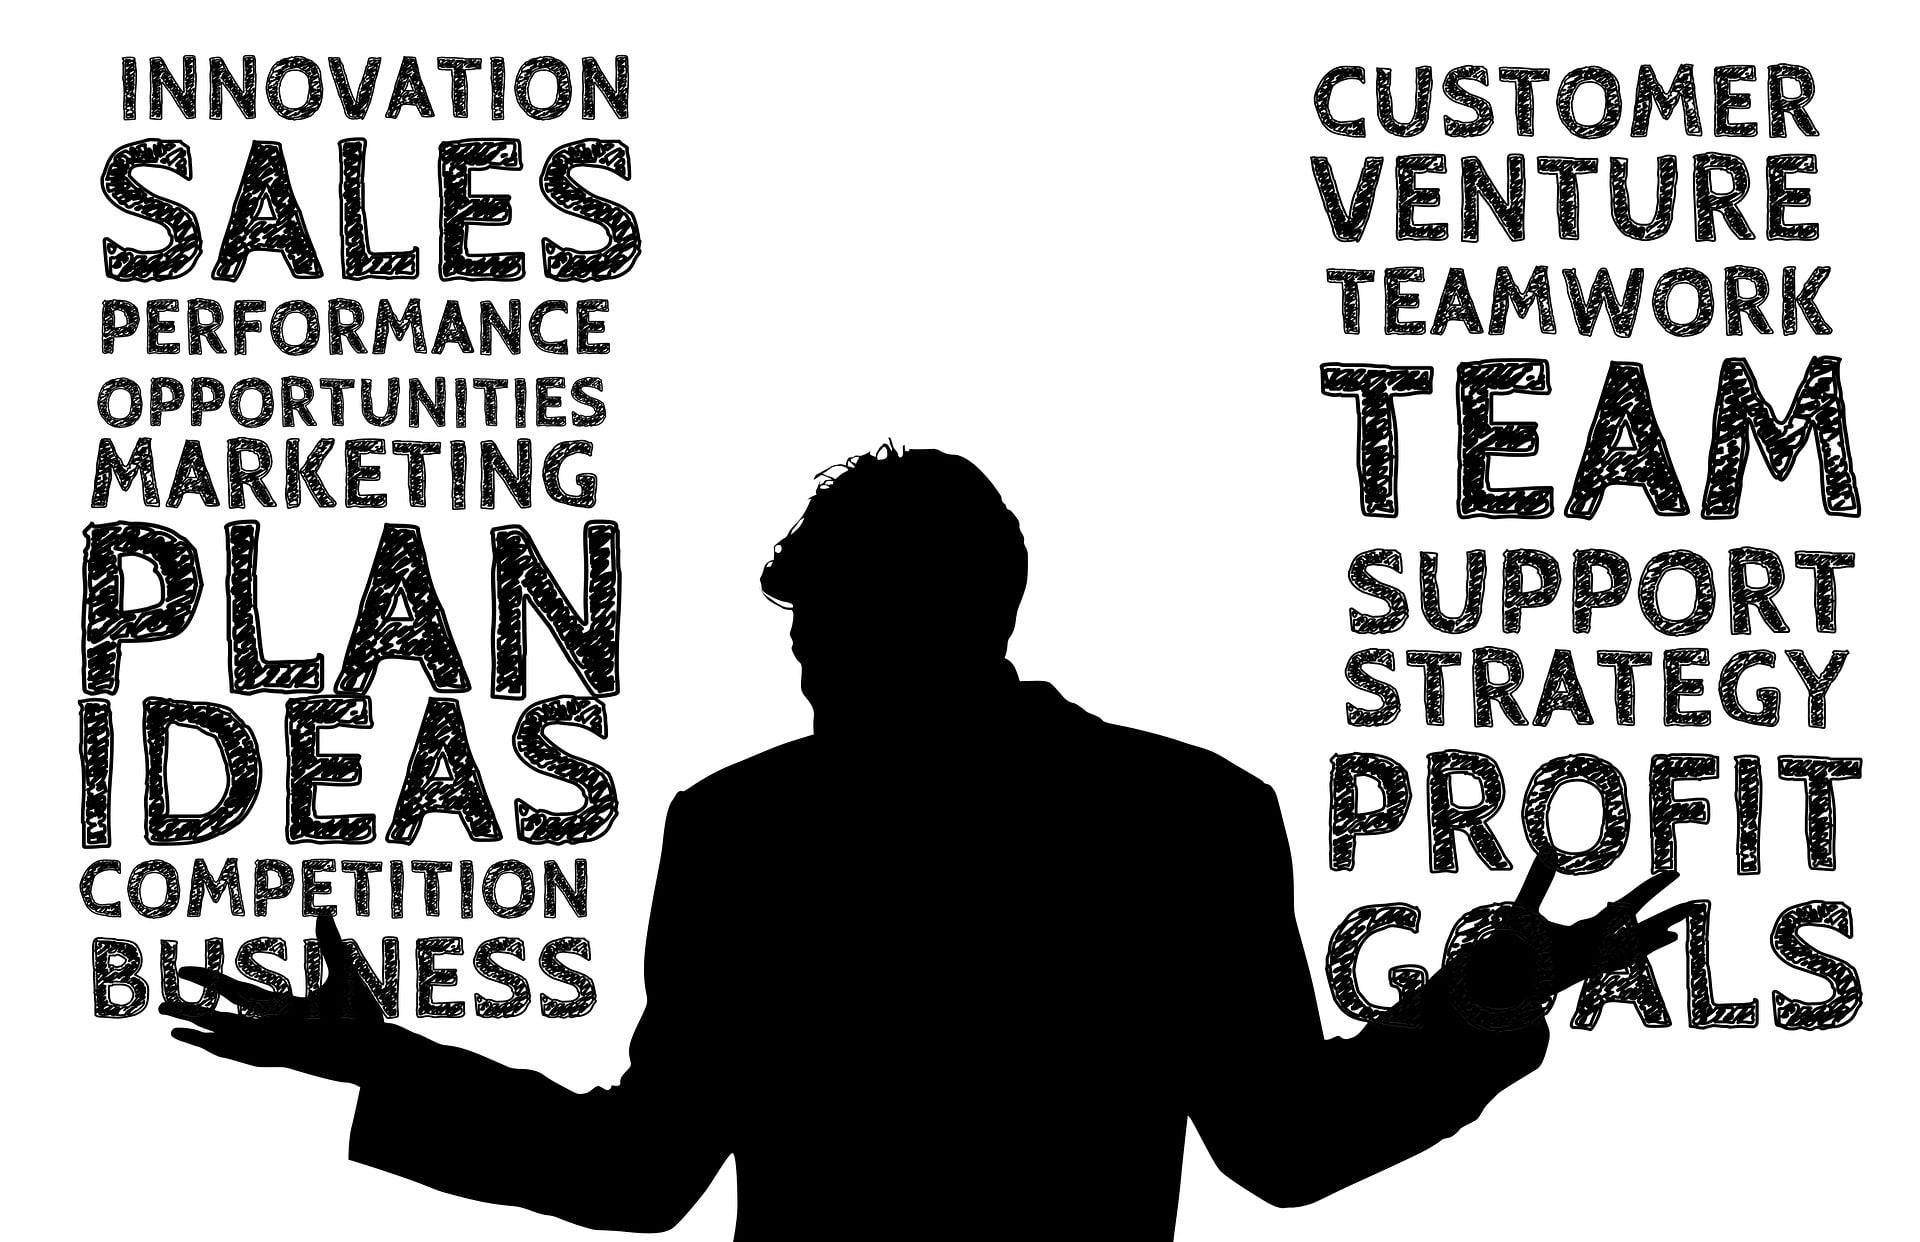 market-driven business